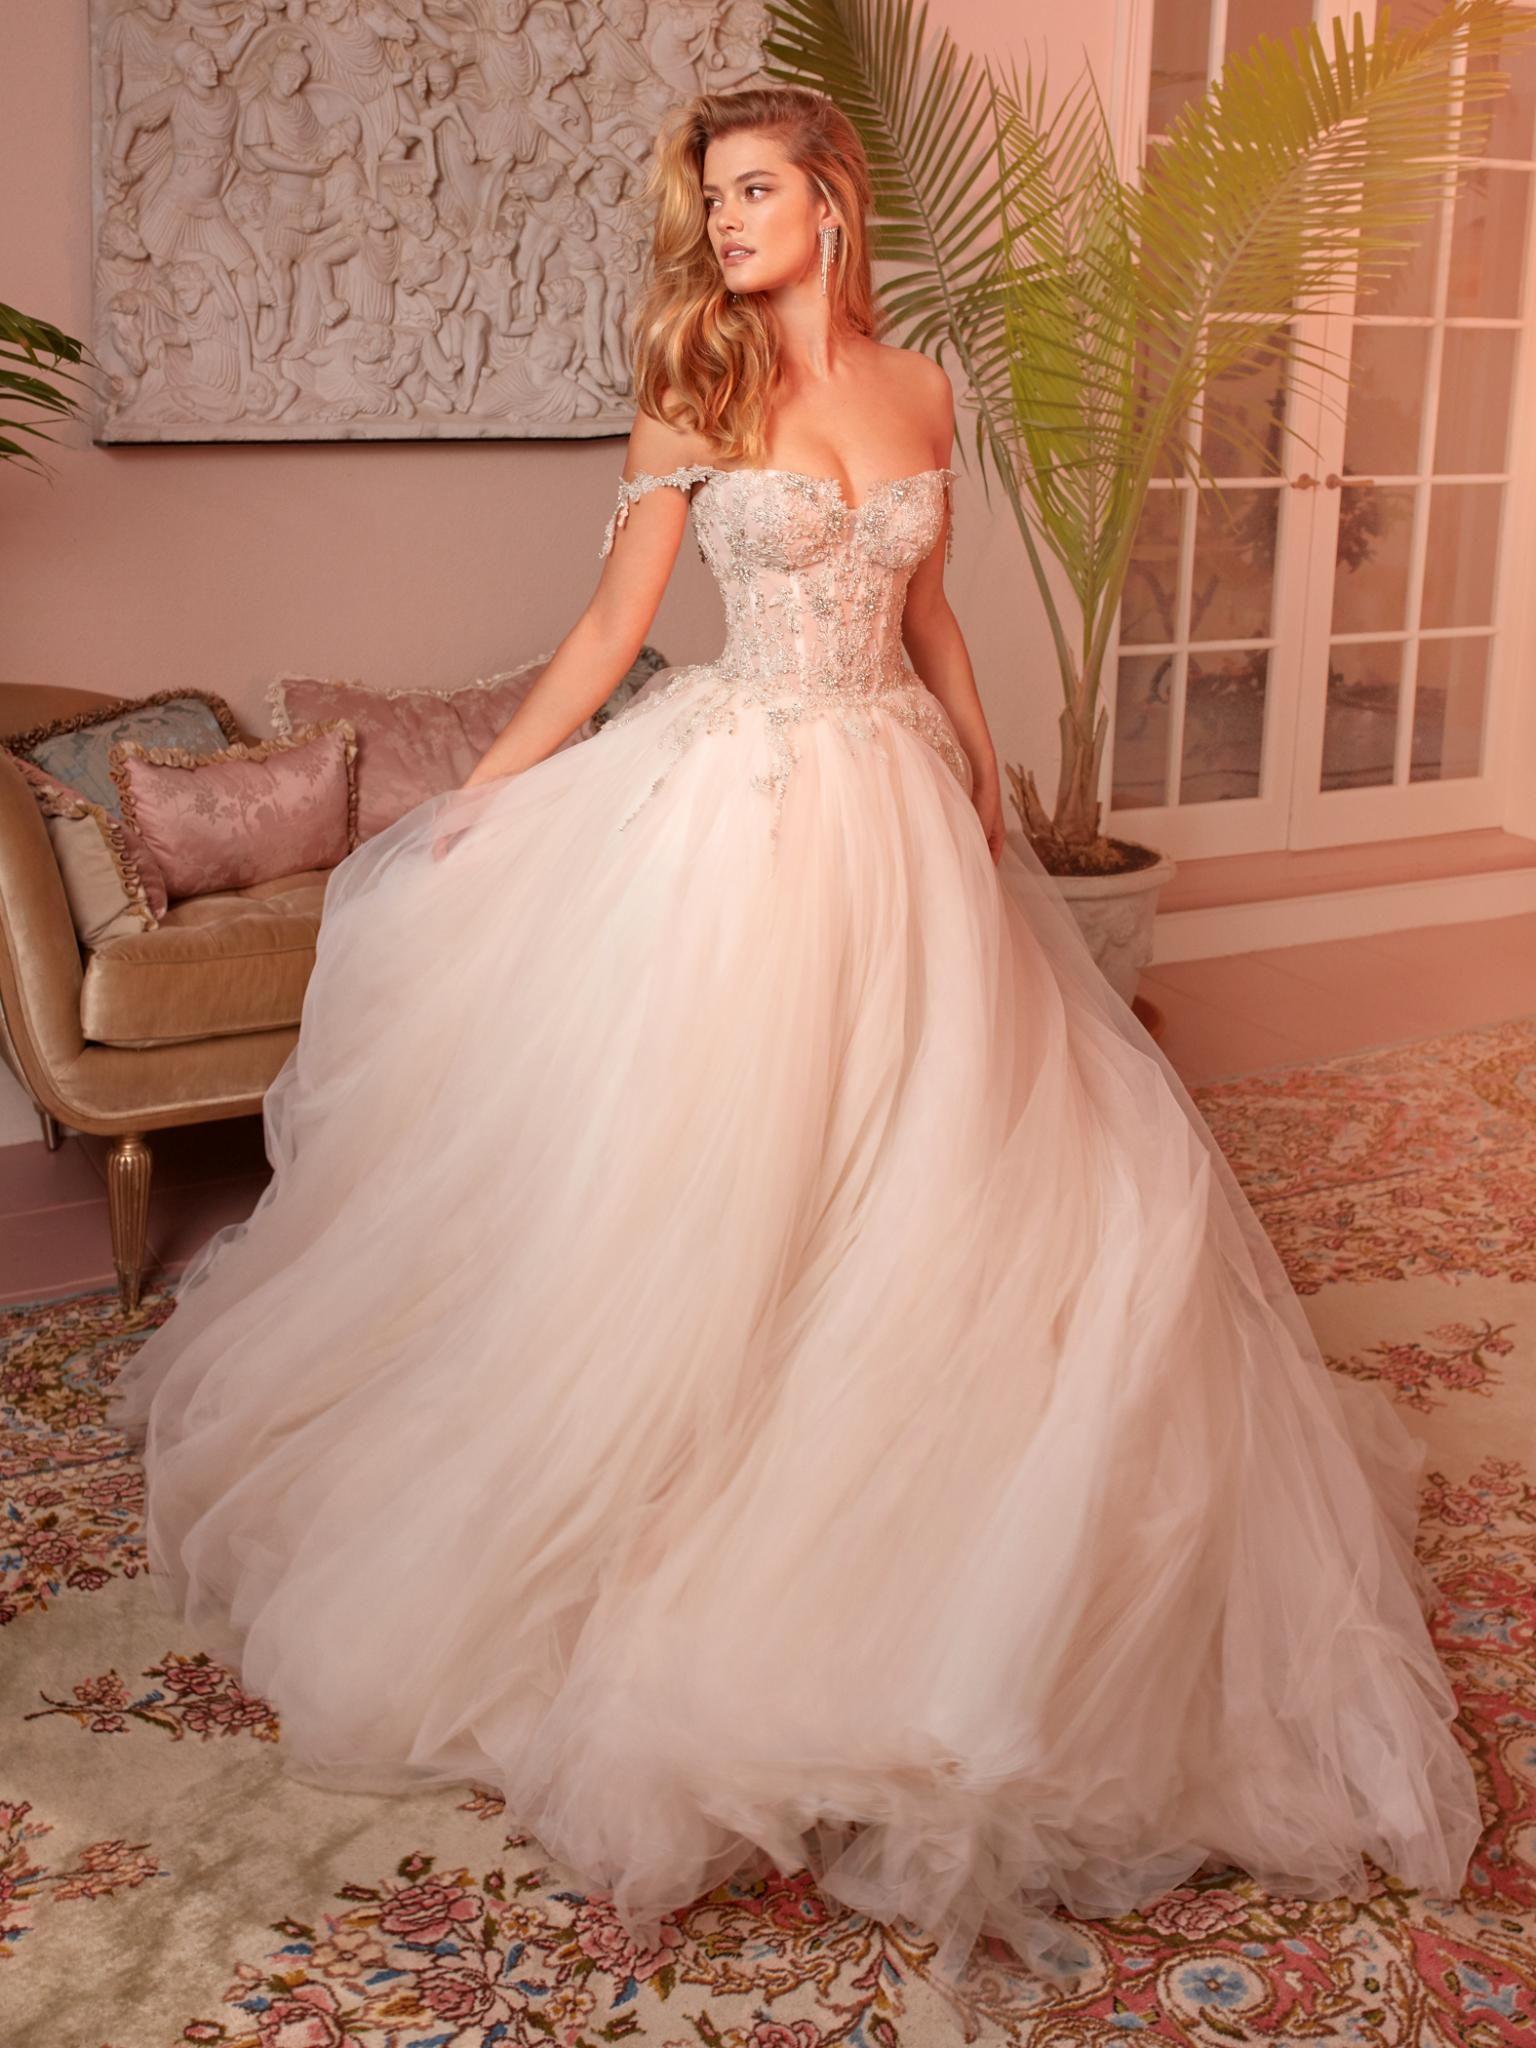 12 Of The Most Stunning Wedding Dress Ballgowns Wedding Dress Trends Wedding Dresses Blush Wedding Dresses Corset [ 2048 x 1536 Pixel ]